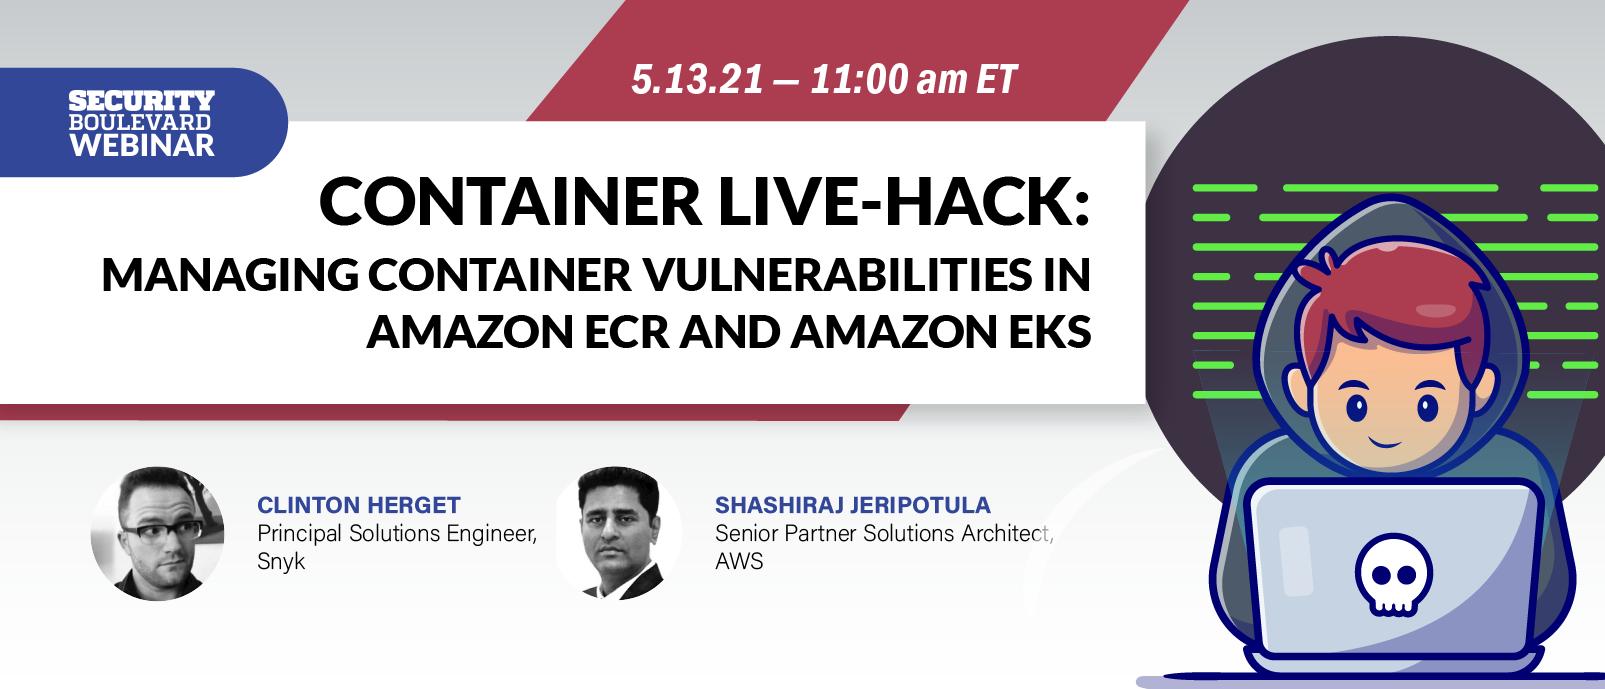 Container Live-Hack: Managing Container Vulnerabilities in Amazon ECR and Amazon EKS